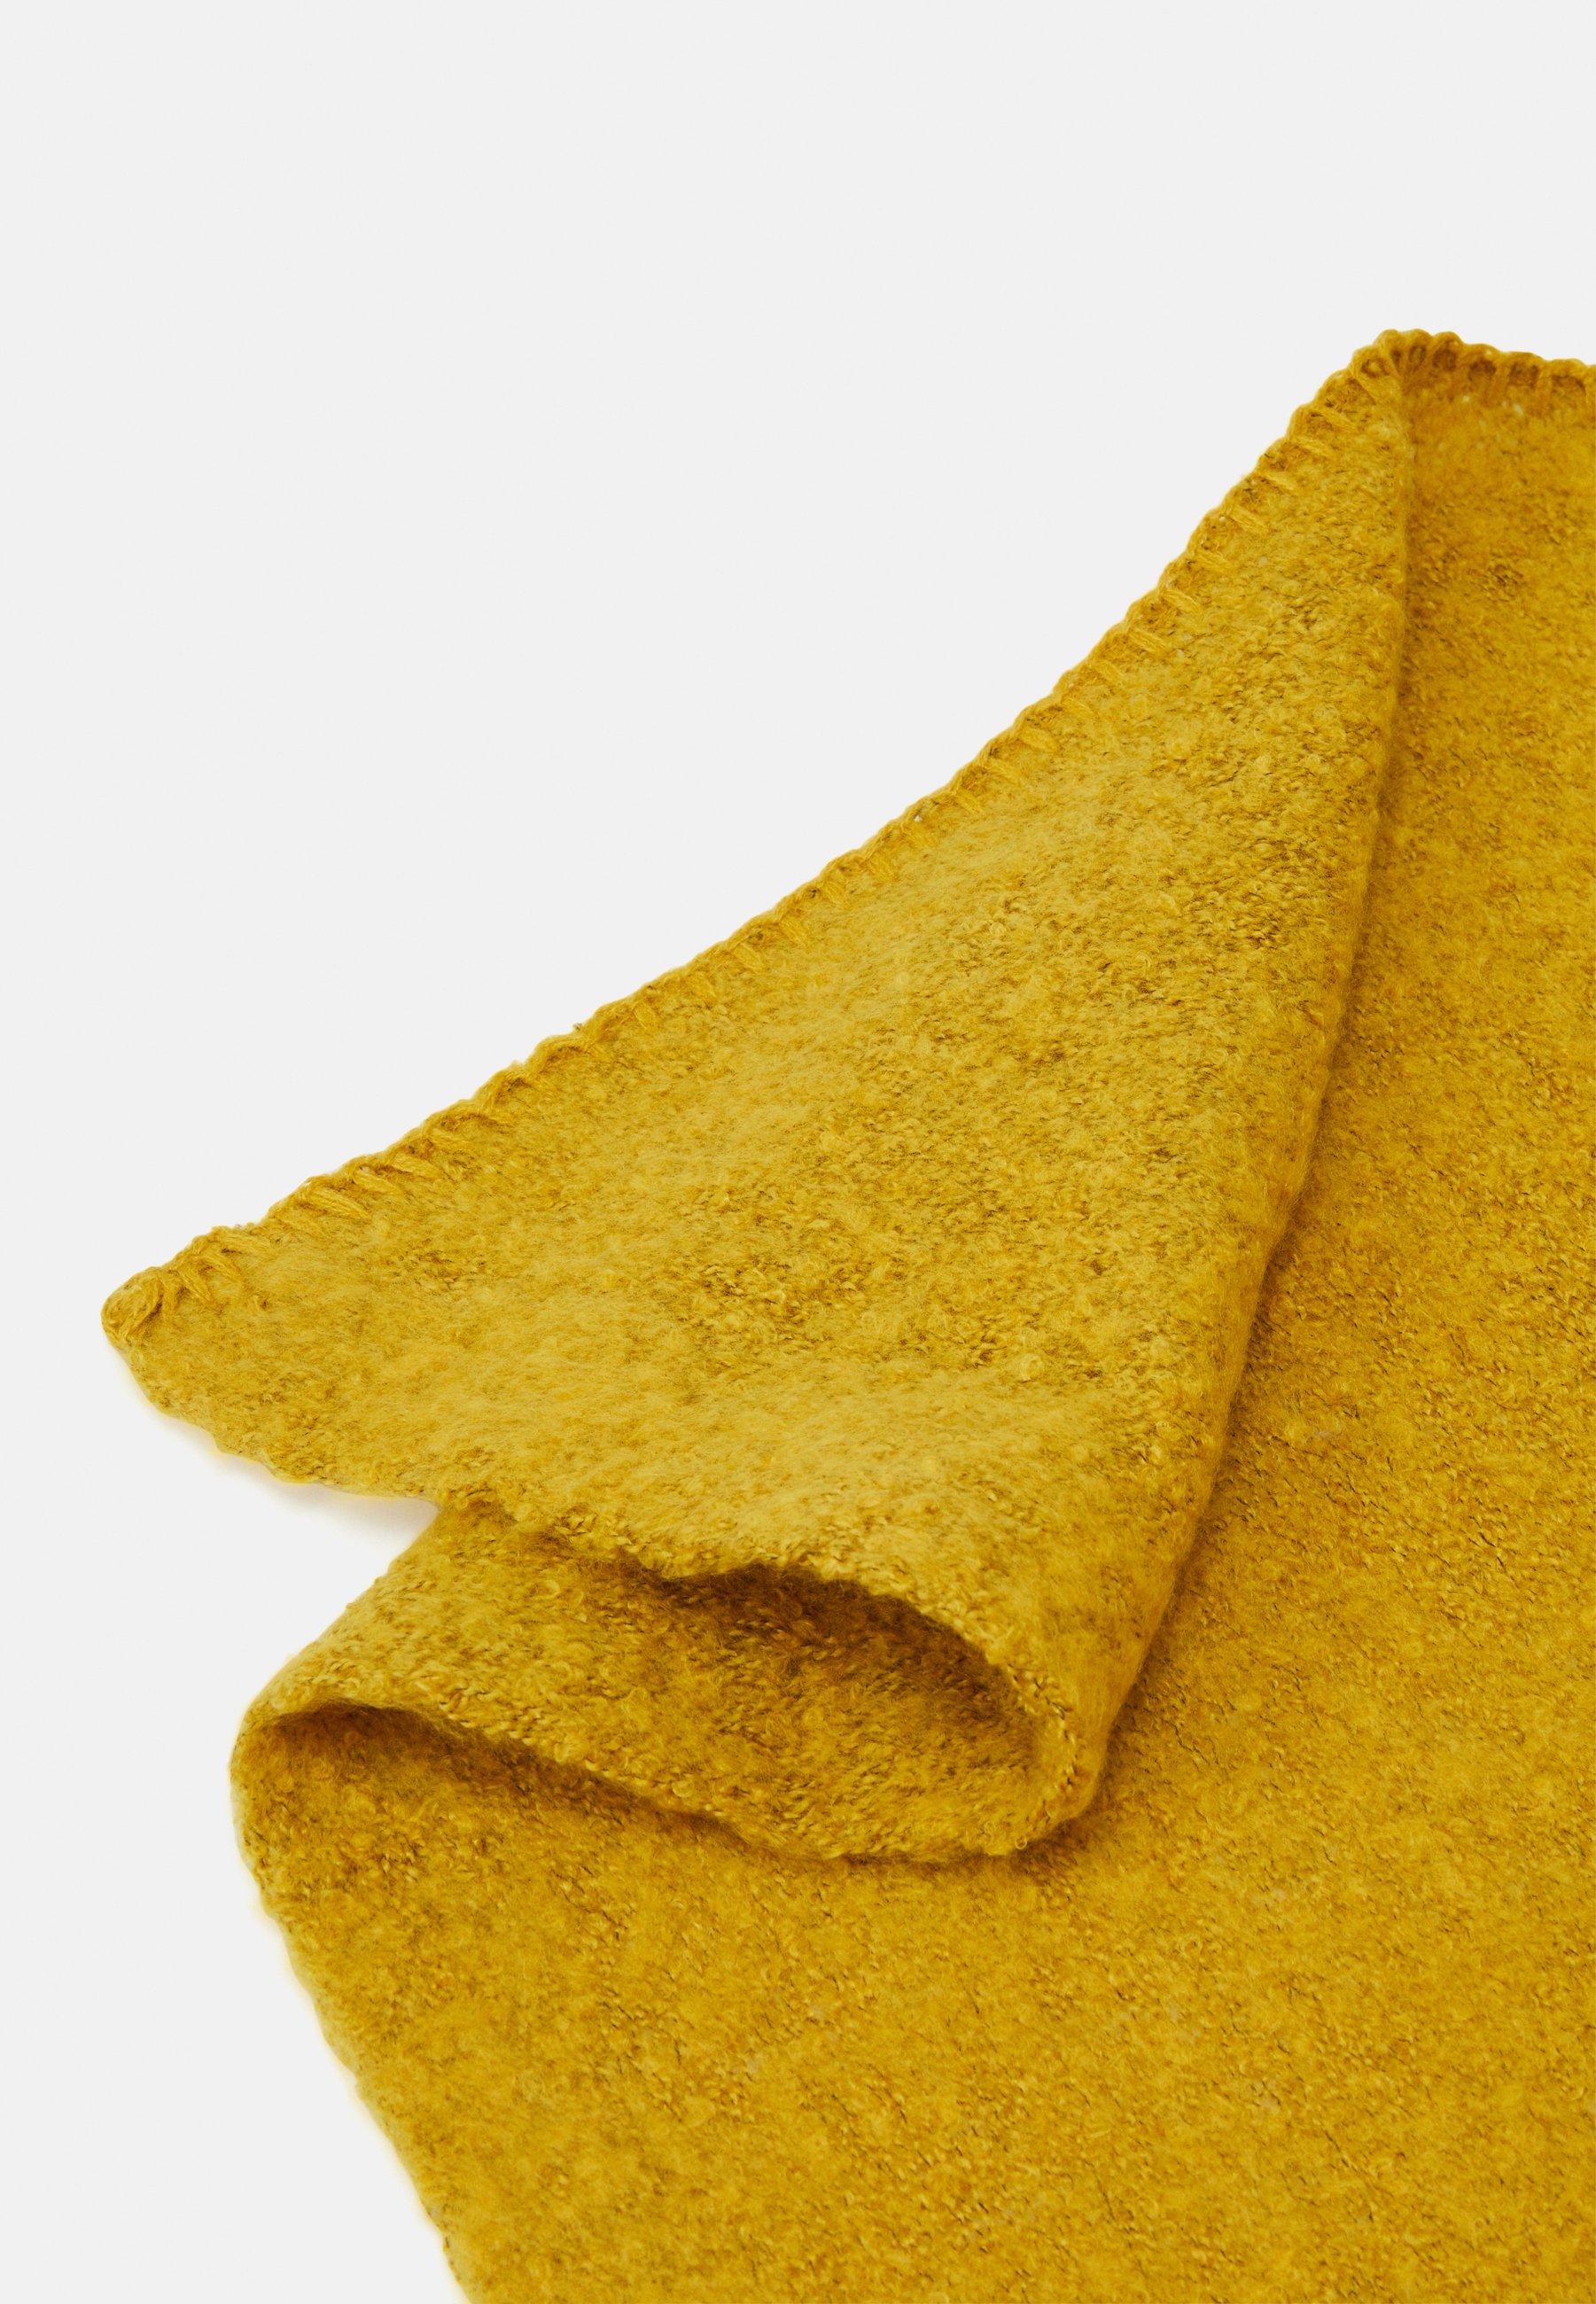 Even&Odd Sjal - mustard yellow/sennep i9Z7eW4V3nHS2pK